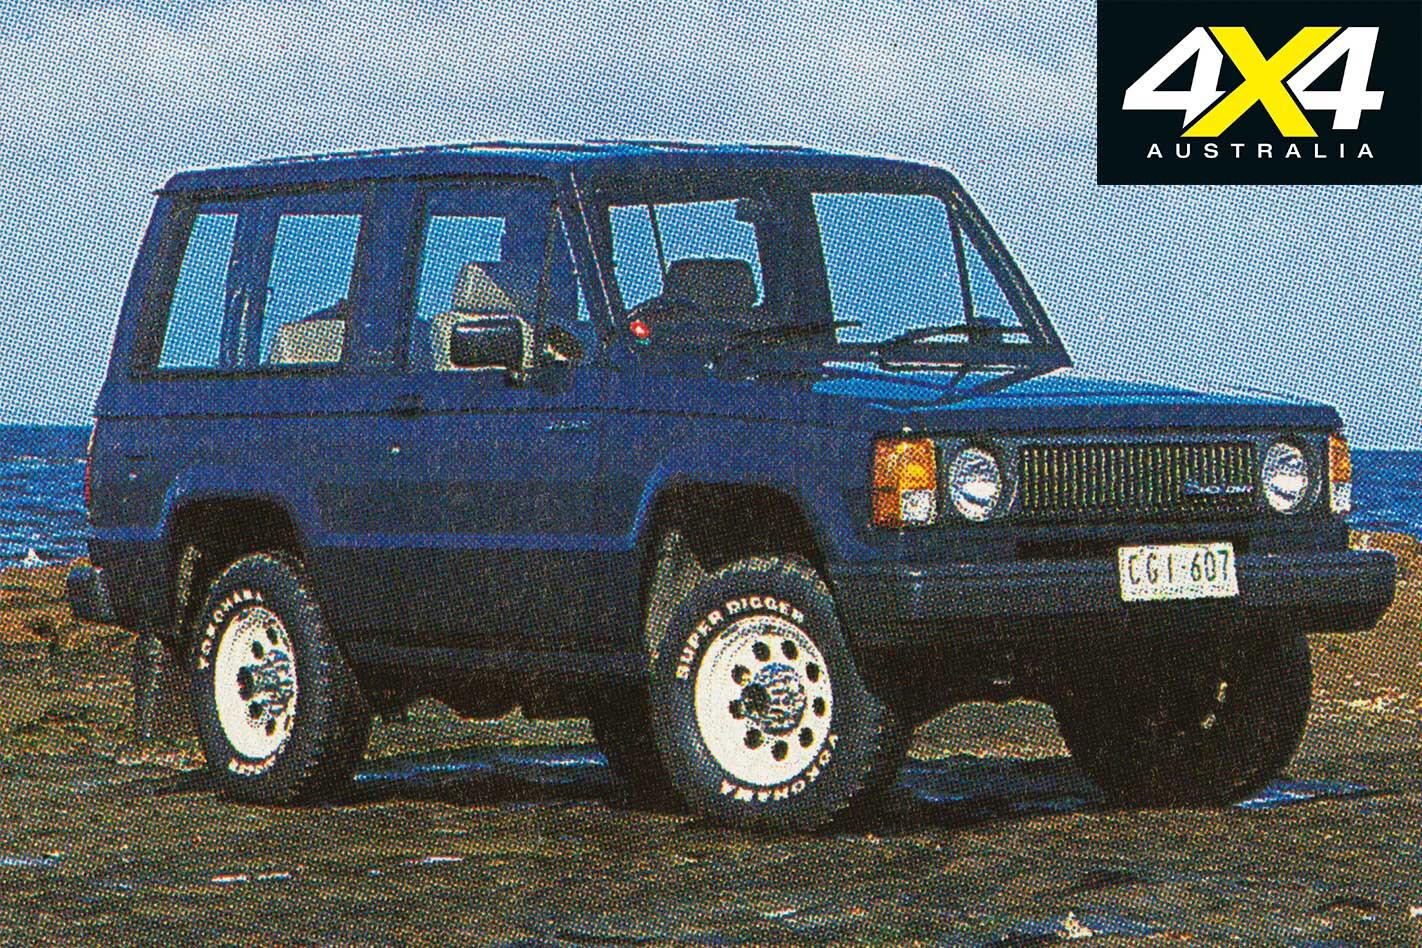 1985 Holden Jackaroo Jpg